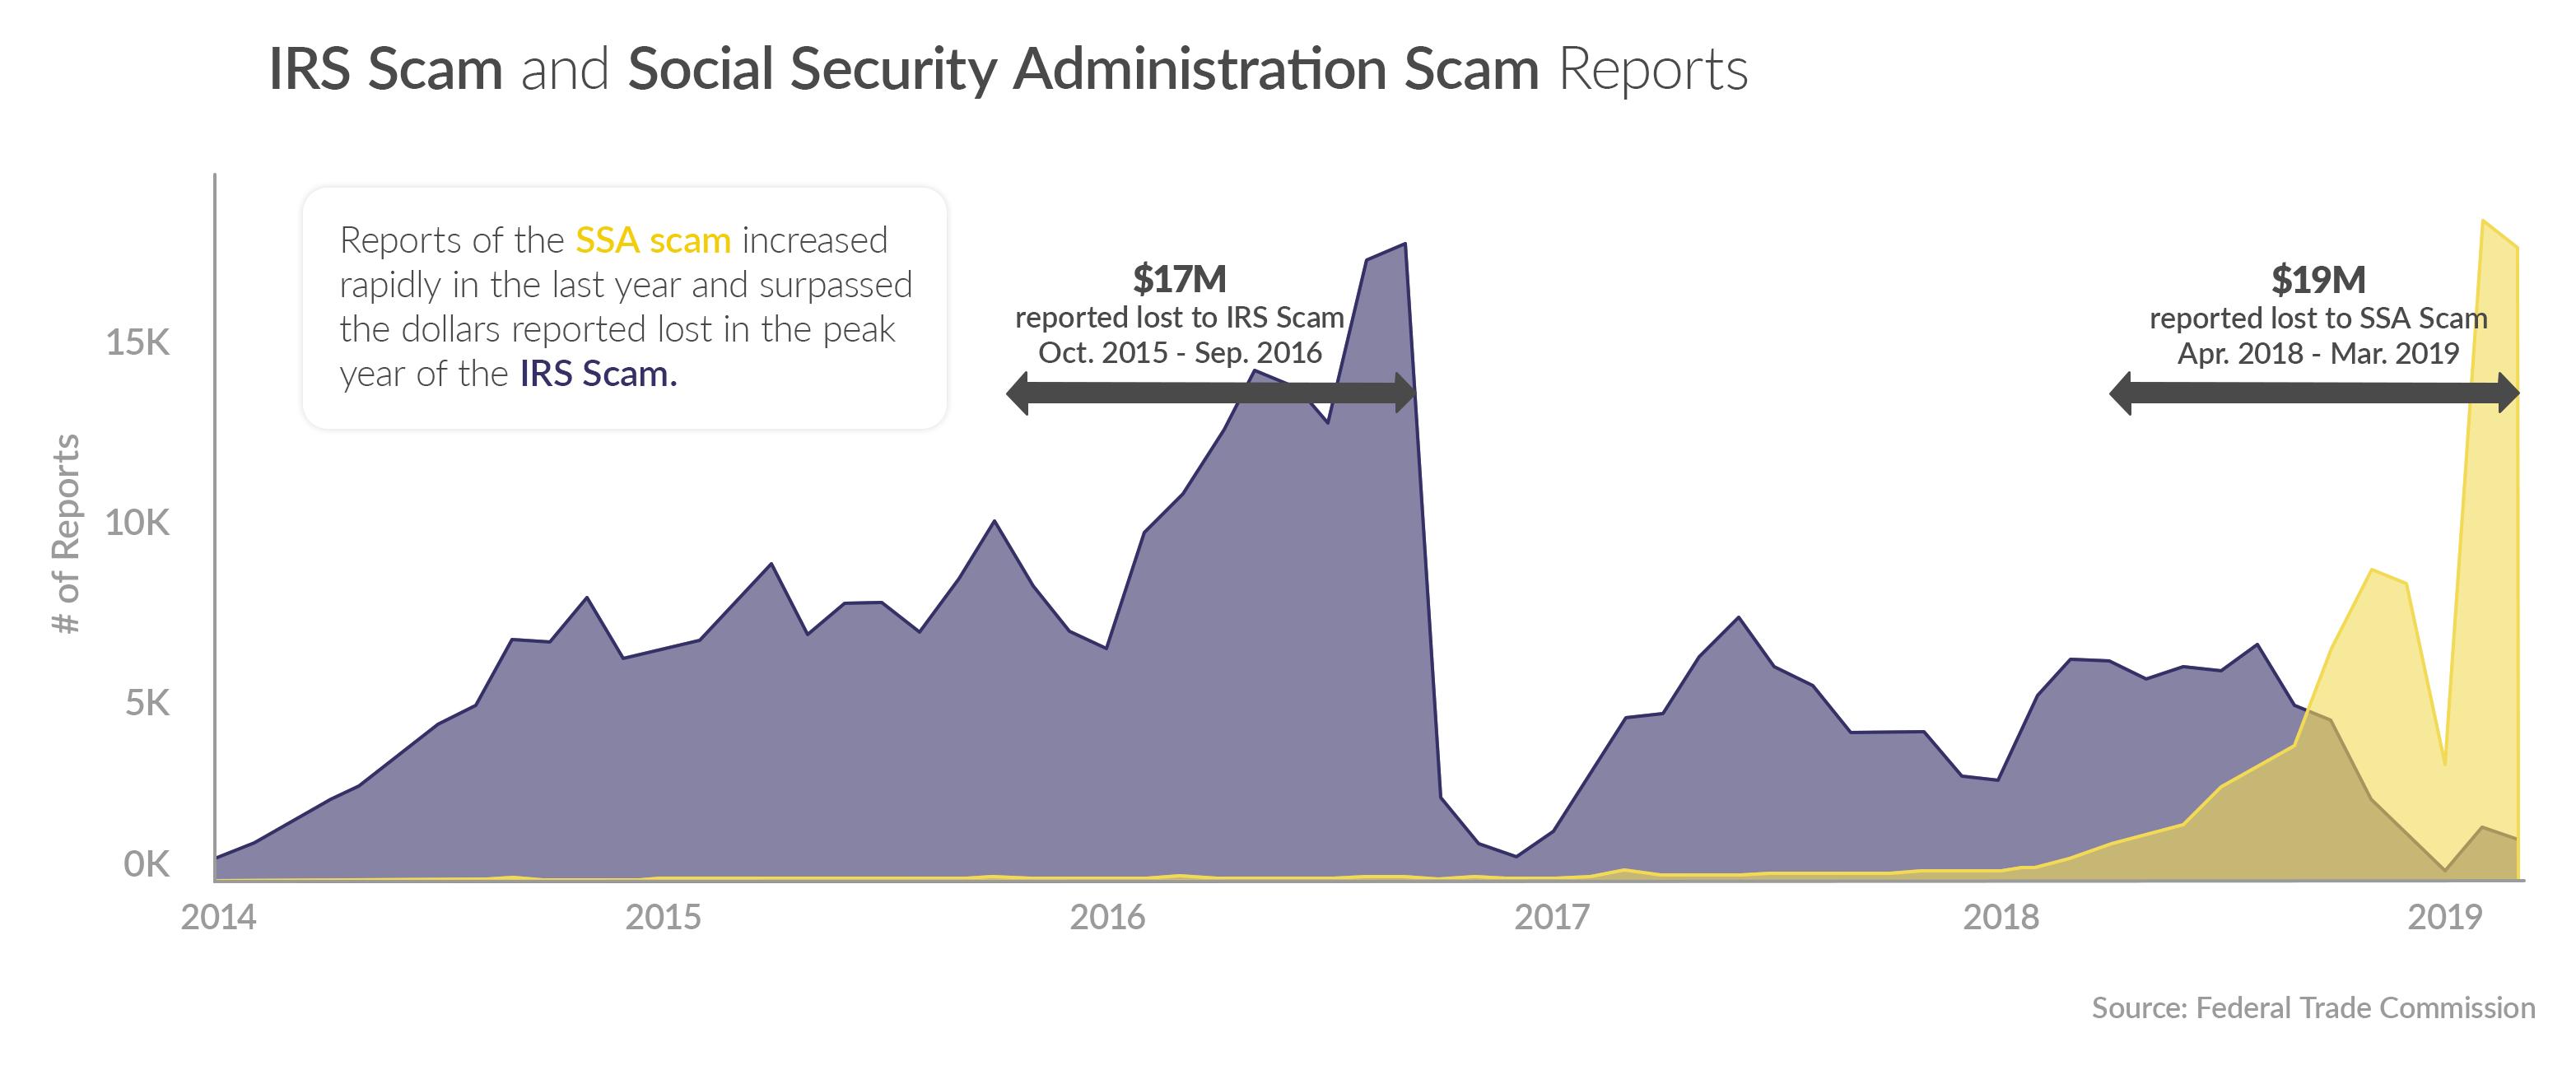 IRS Scam vs. Social Security Scam comparison chart